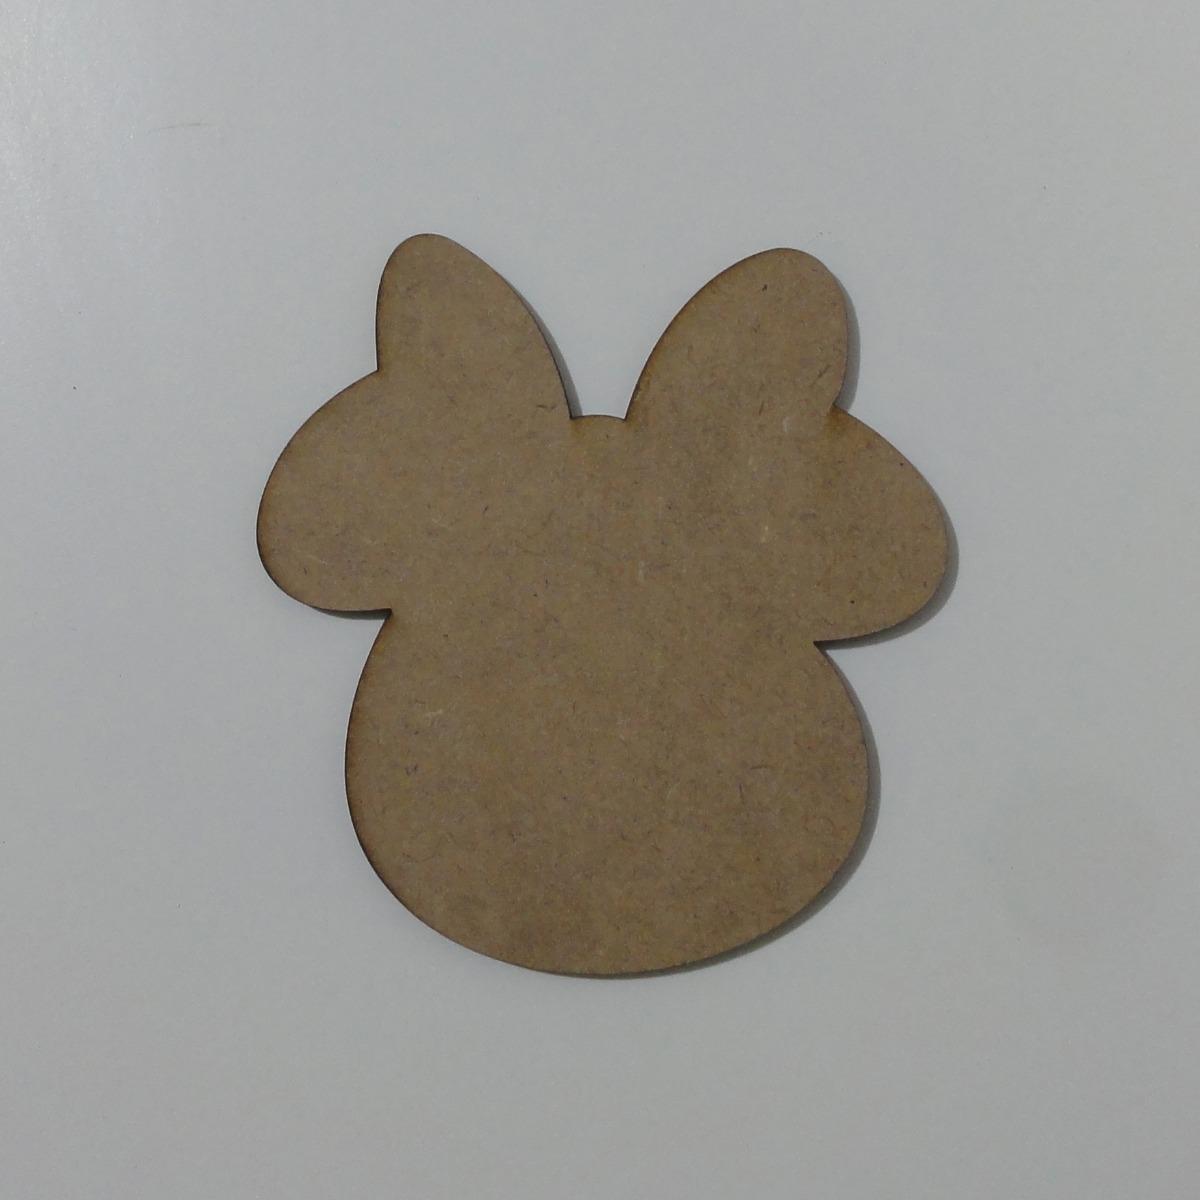 Pizarra Minnie Mouse Cara 30 Cm En Fibrofacil Para Pintar - $ 20,00 ...